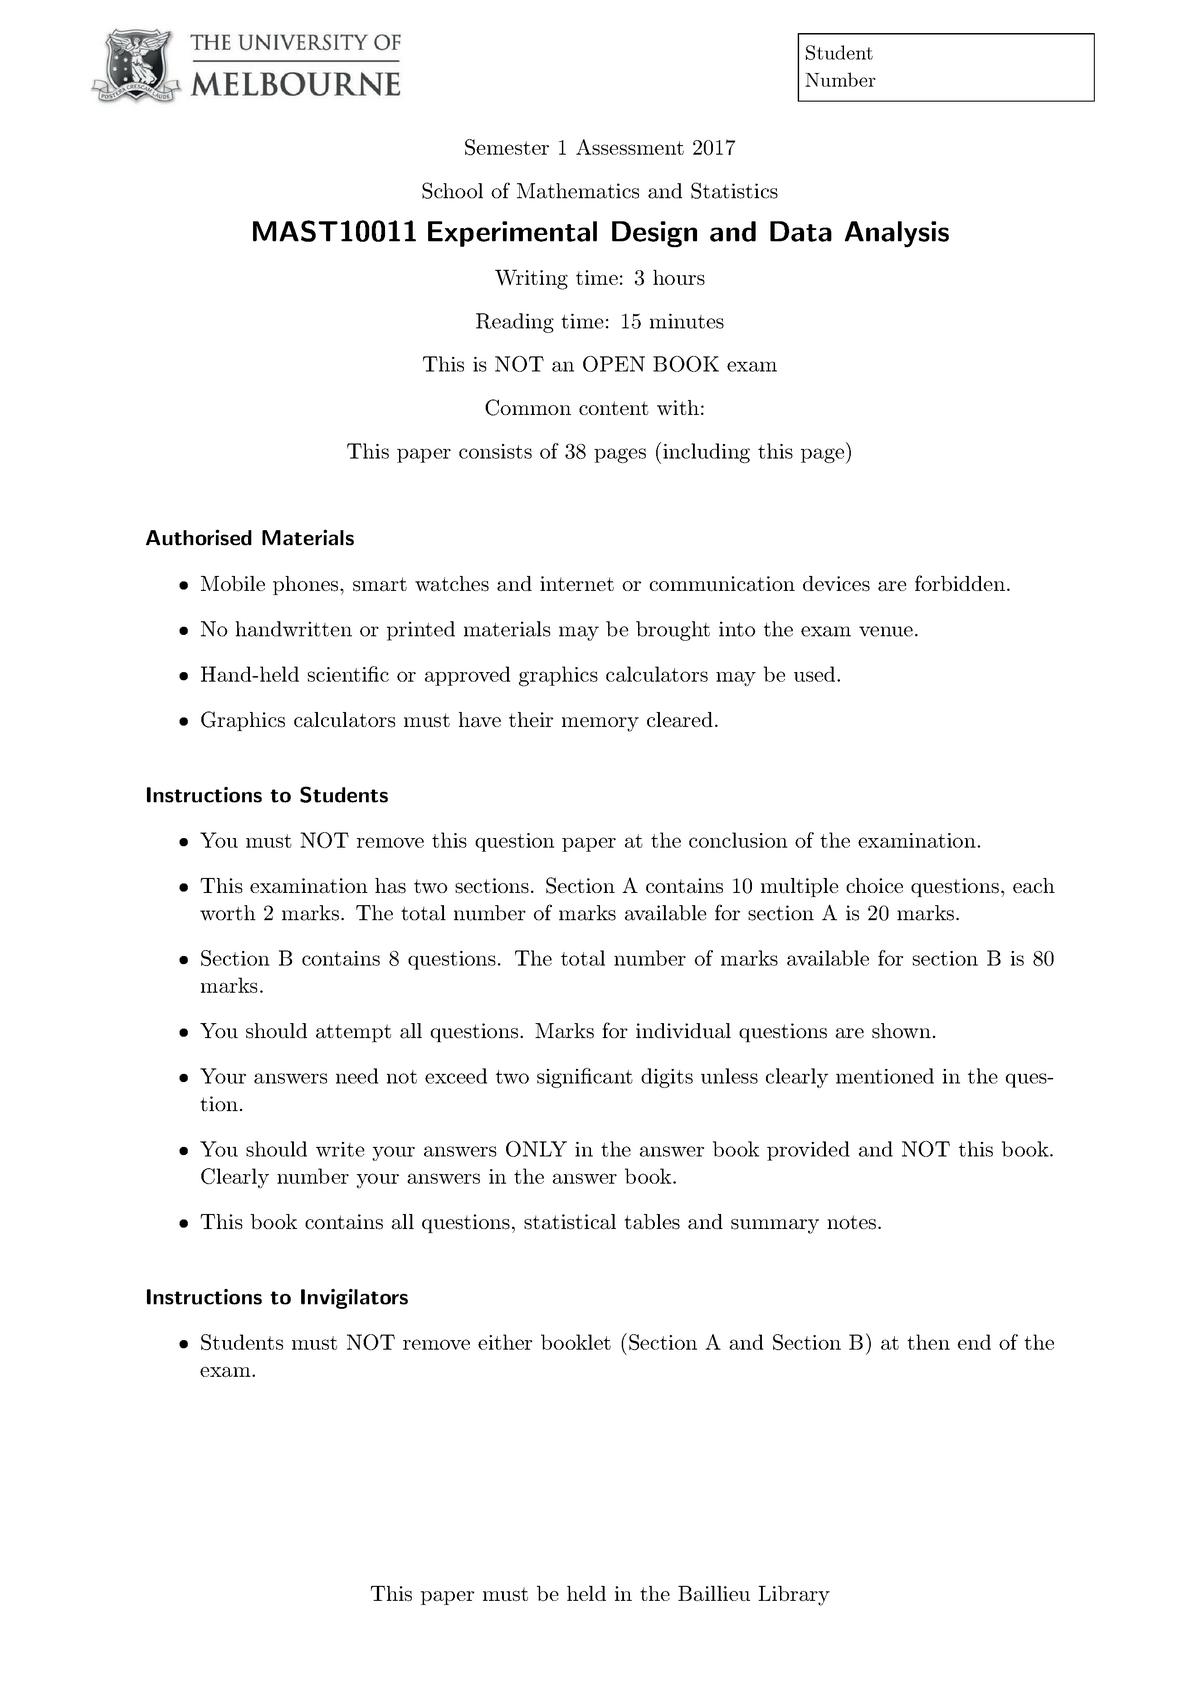 Exam 2017 - MAST10011: Experimental Design And Data Analysis - StuDocu